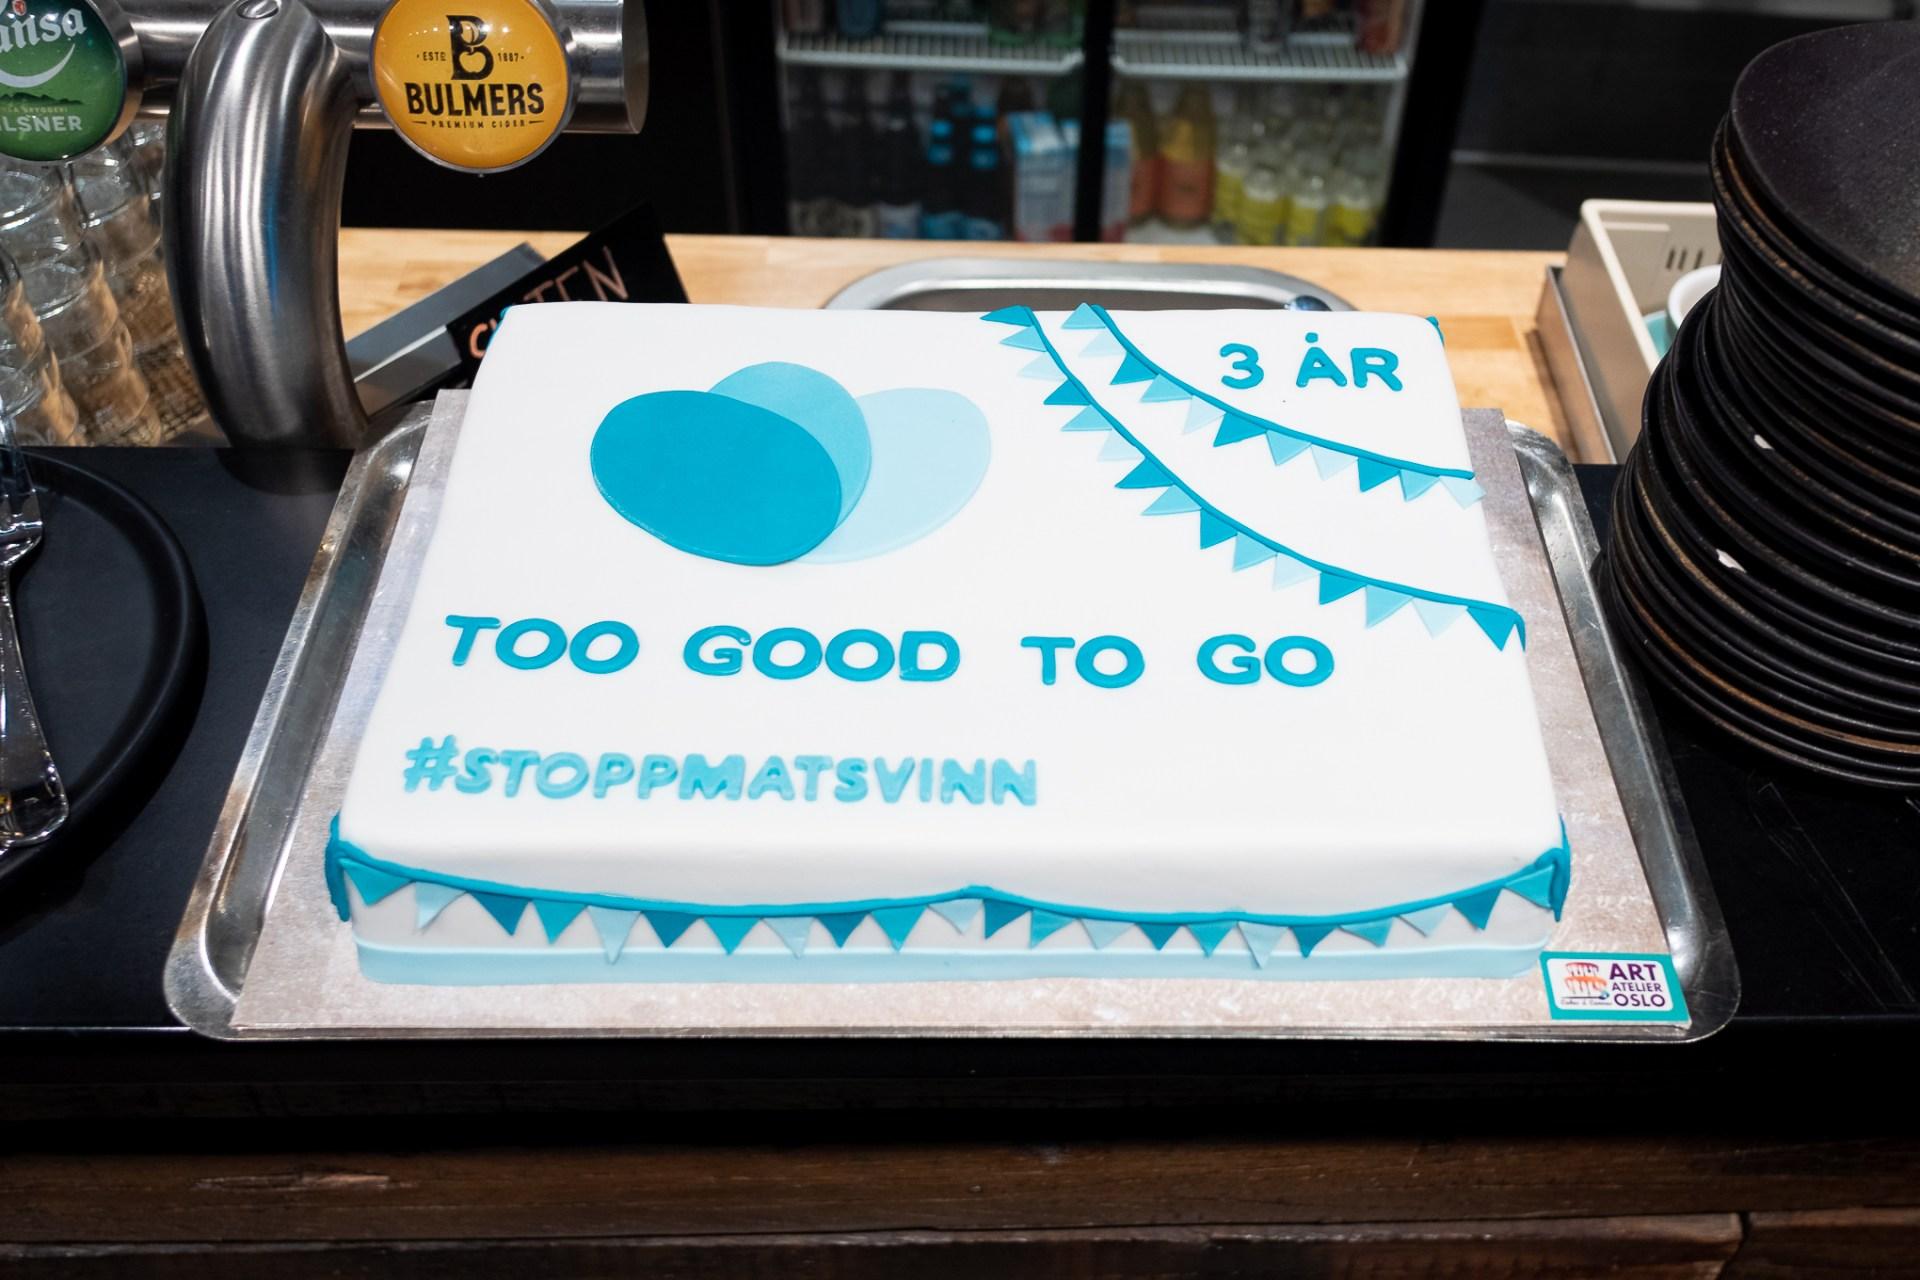 Foto: Kristian i Too Good To Go